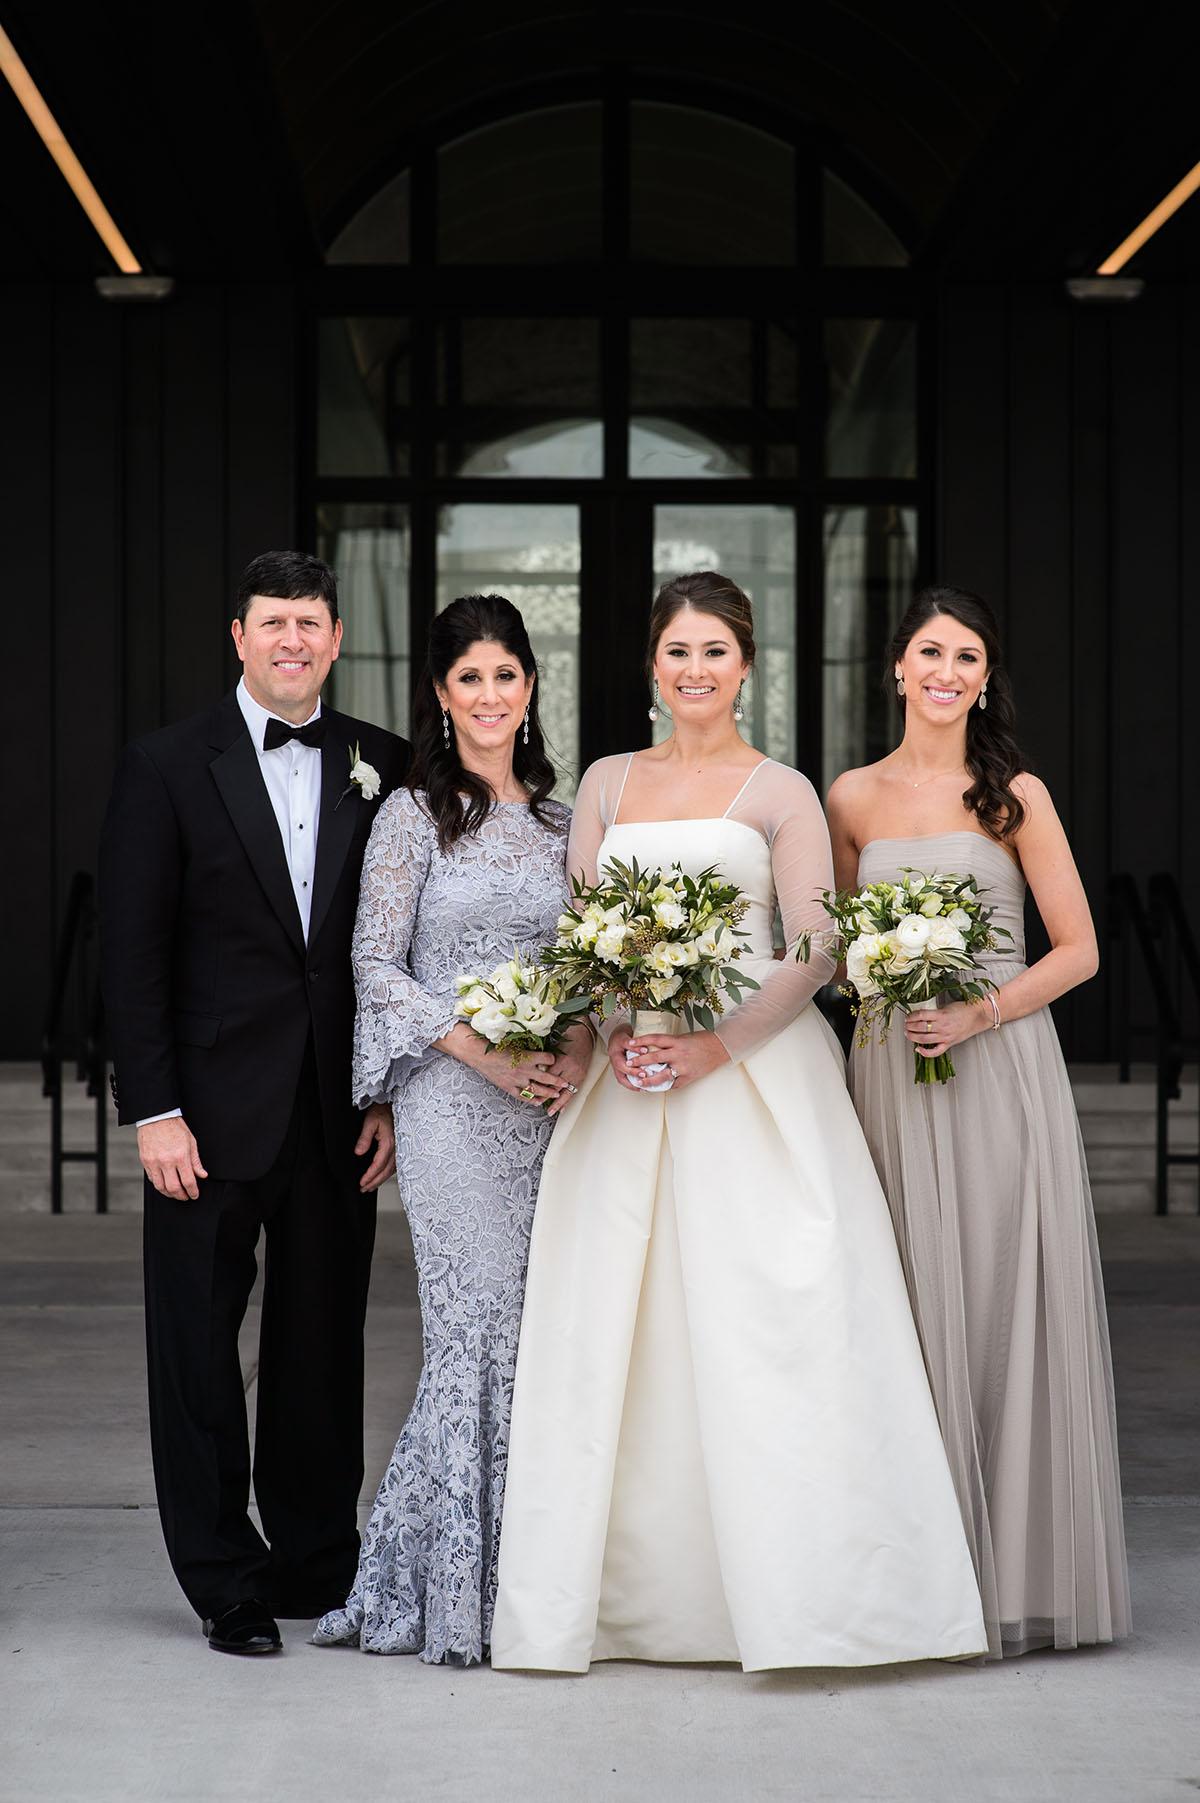 Michael and Trisha McGaw, Jenna Fondren and Ashley McGaw